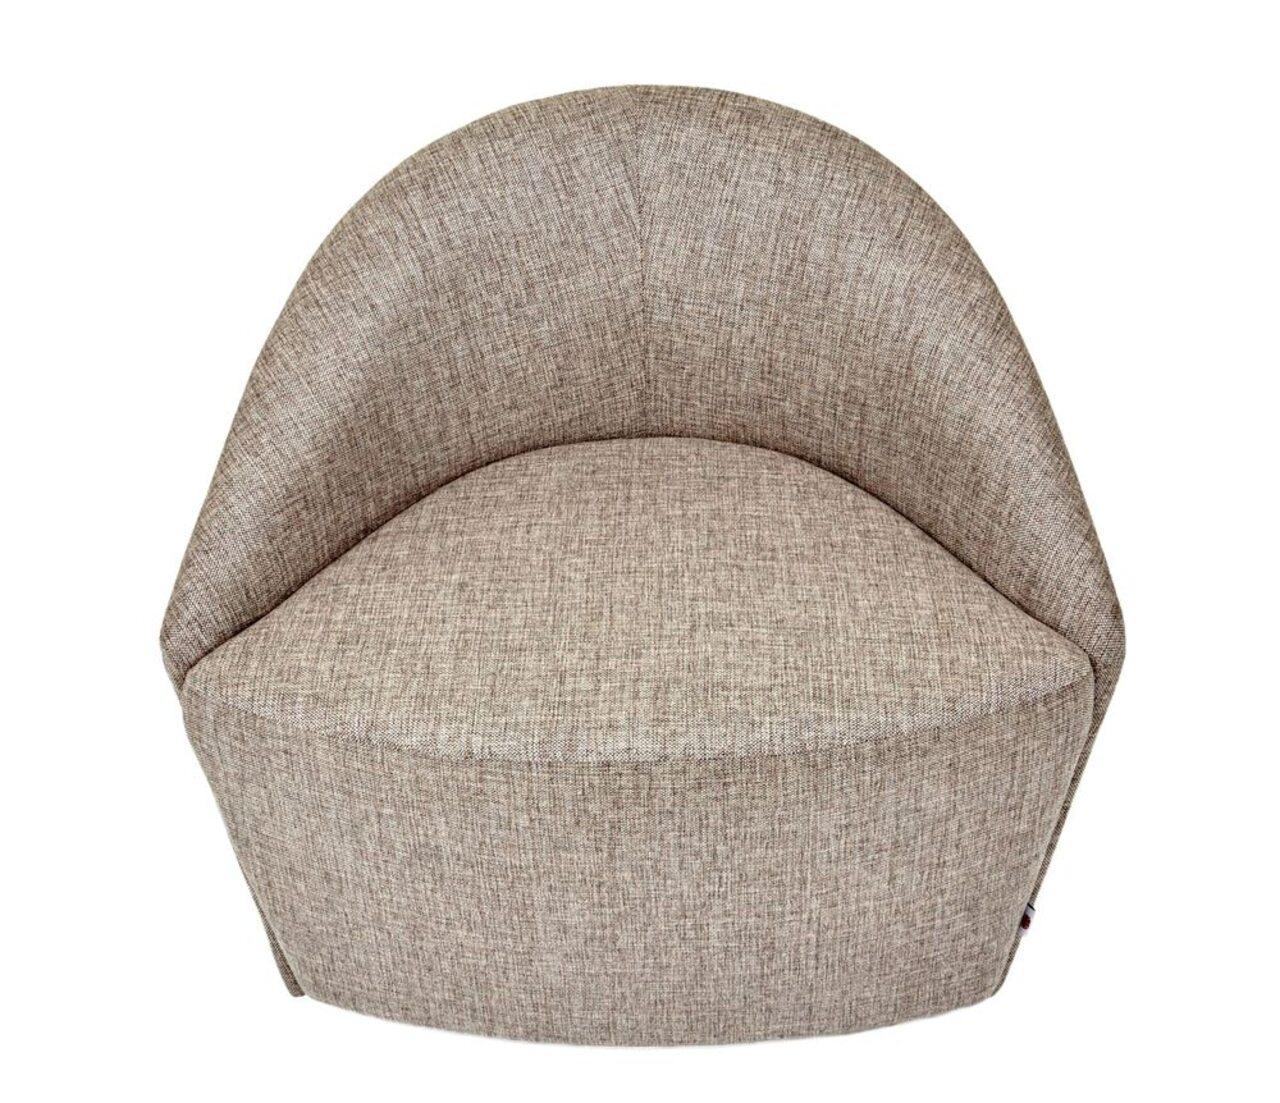 Кресло стационарное  3D 79x65x71 - фото 6